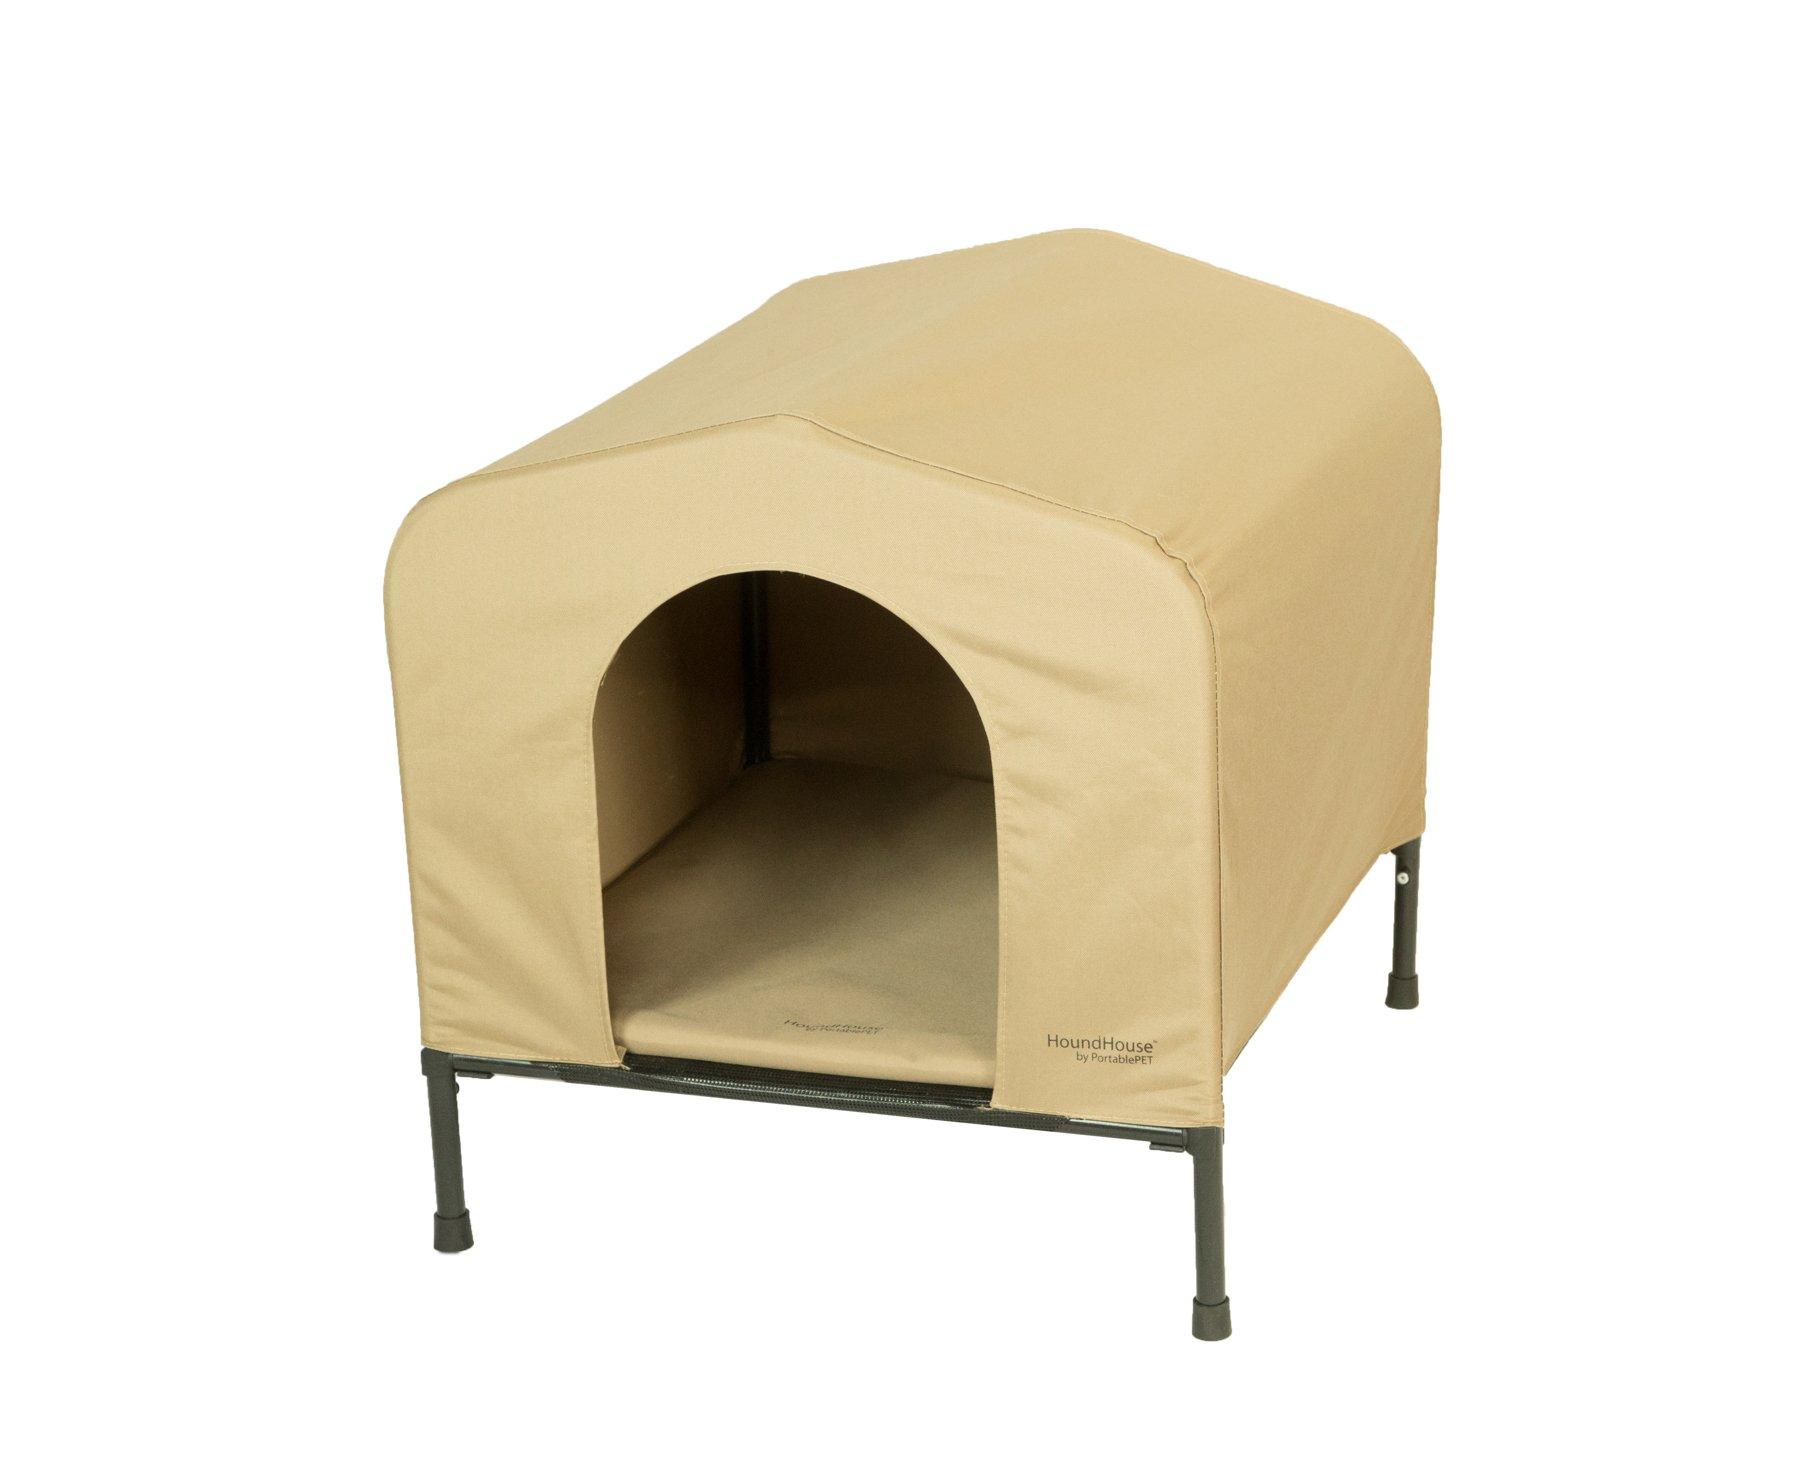 Heininger 3096 PortablePET Large Khaki HoundHouse Kennel and Shelter by Heininger